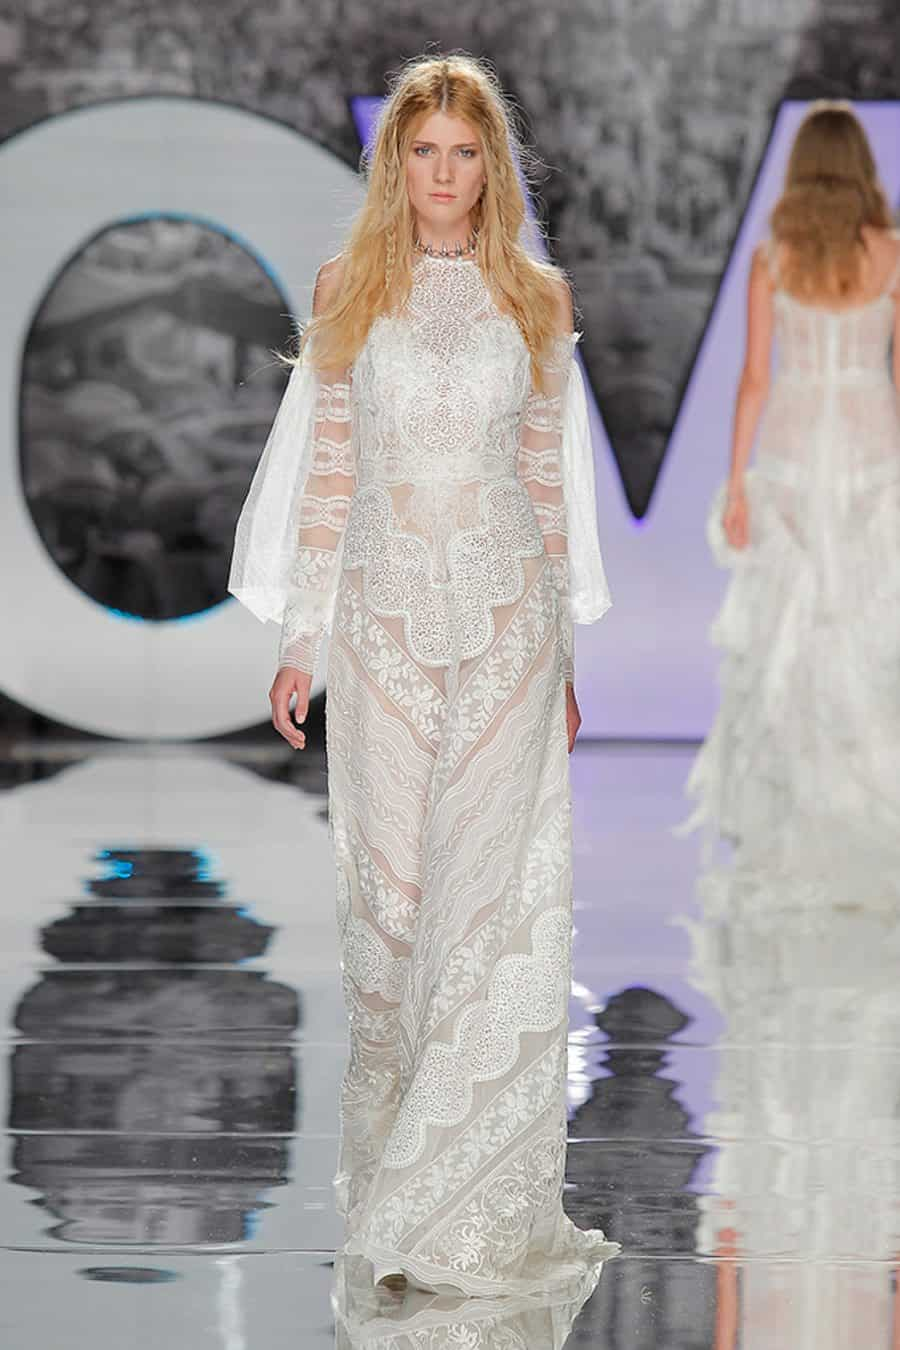 yolancris-weddingdress-bride-boho-chic-folk-wedding-dress-couture-fashion-desing-bohodress-36